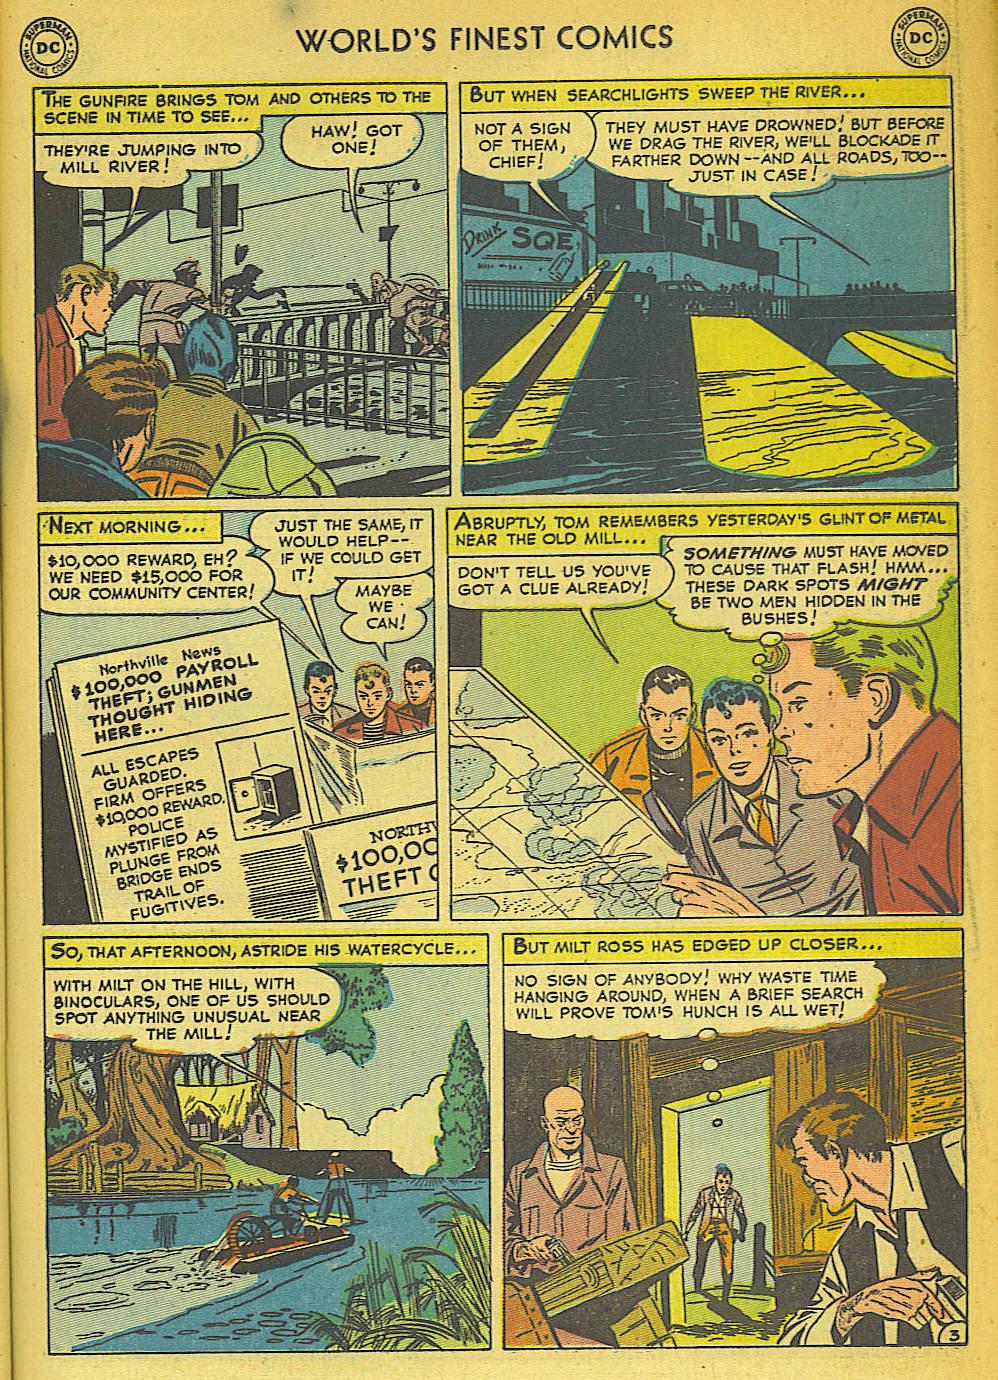 Read online World's Finest Comics comic -  Issue #57 - 43